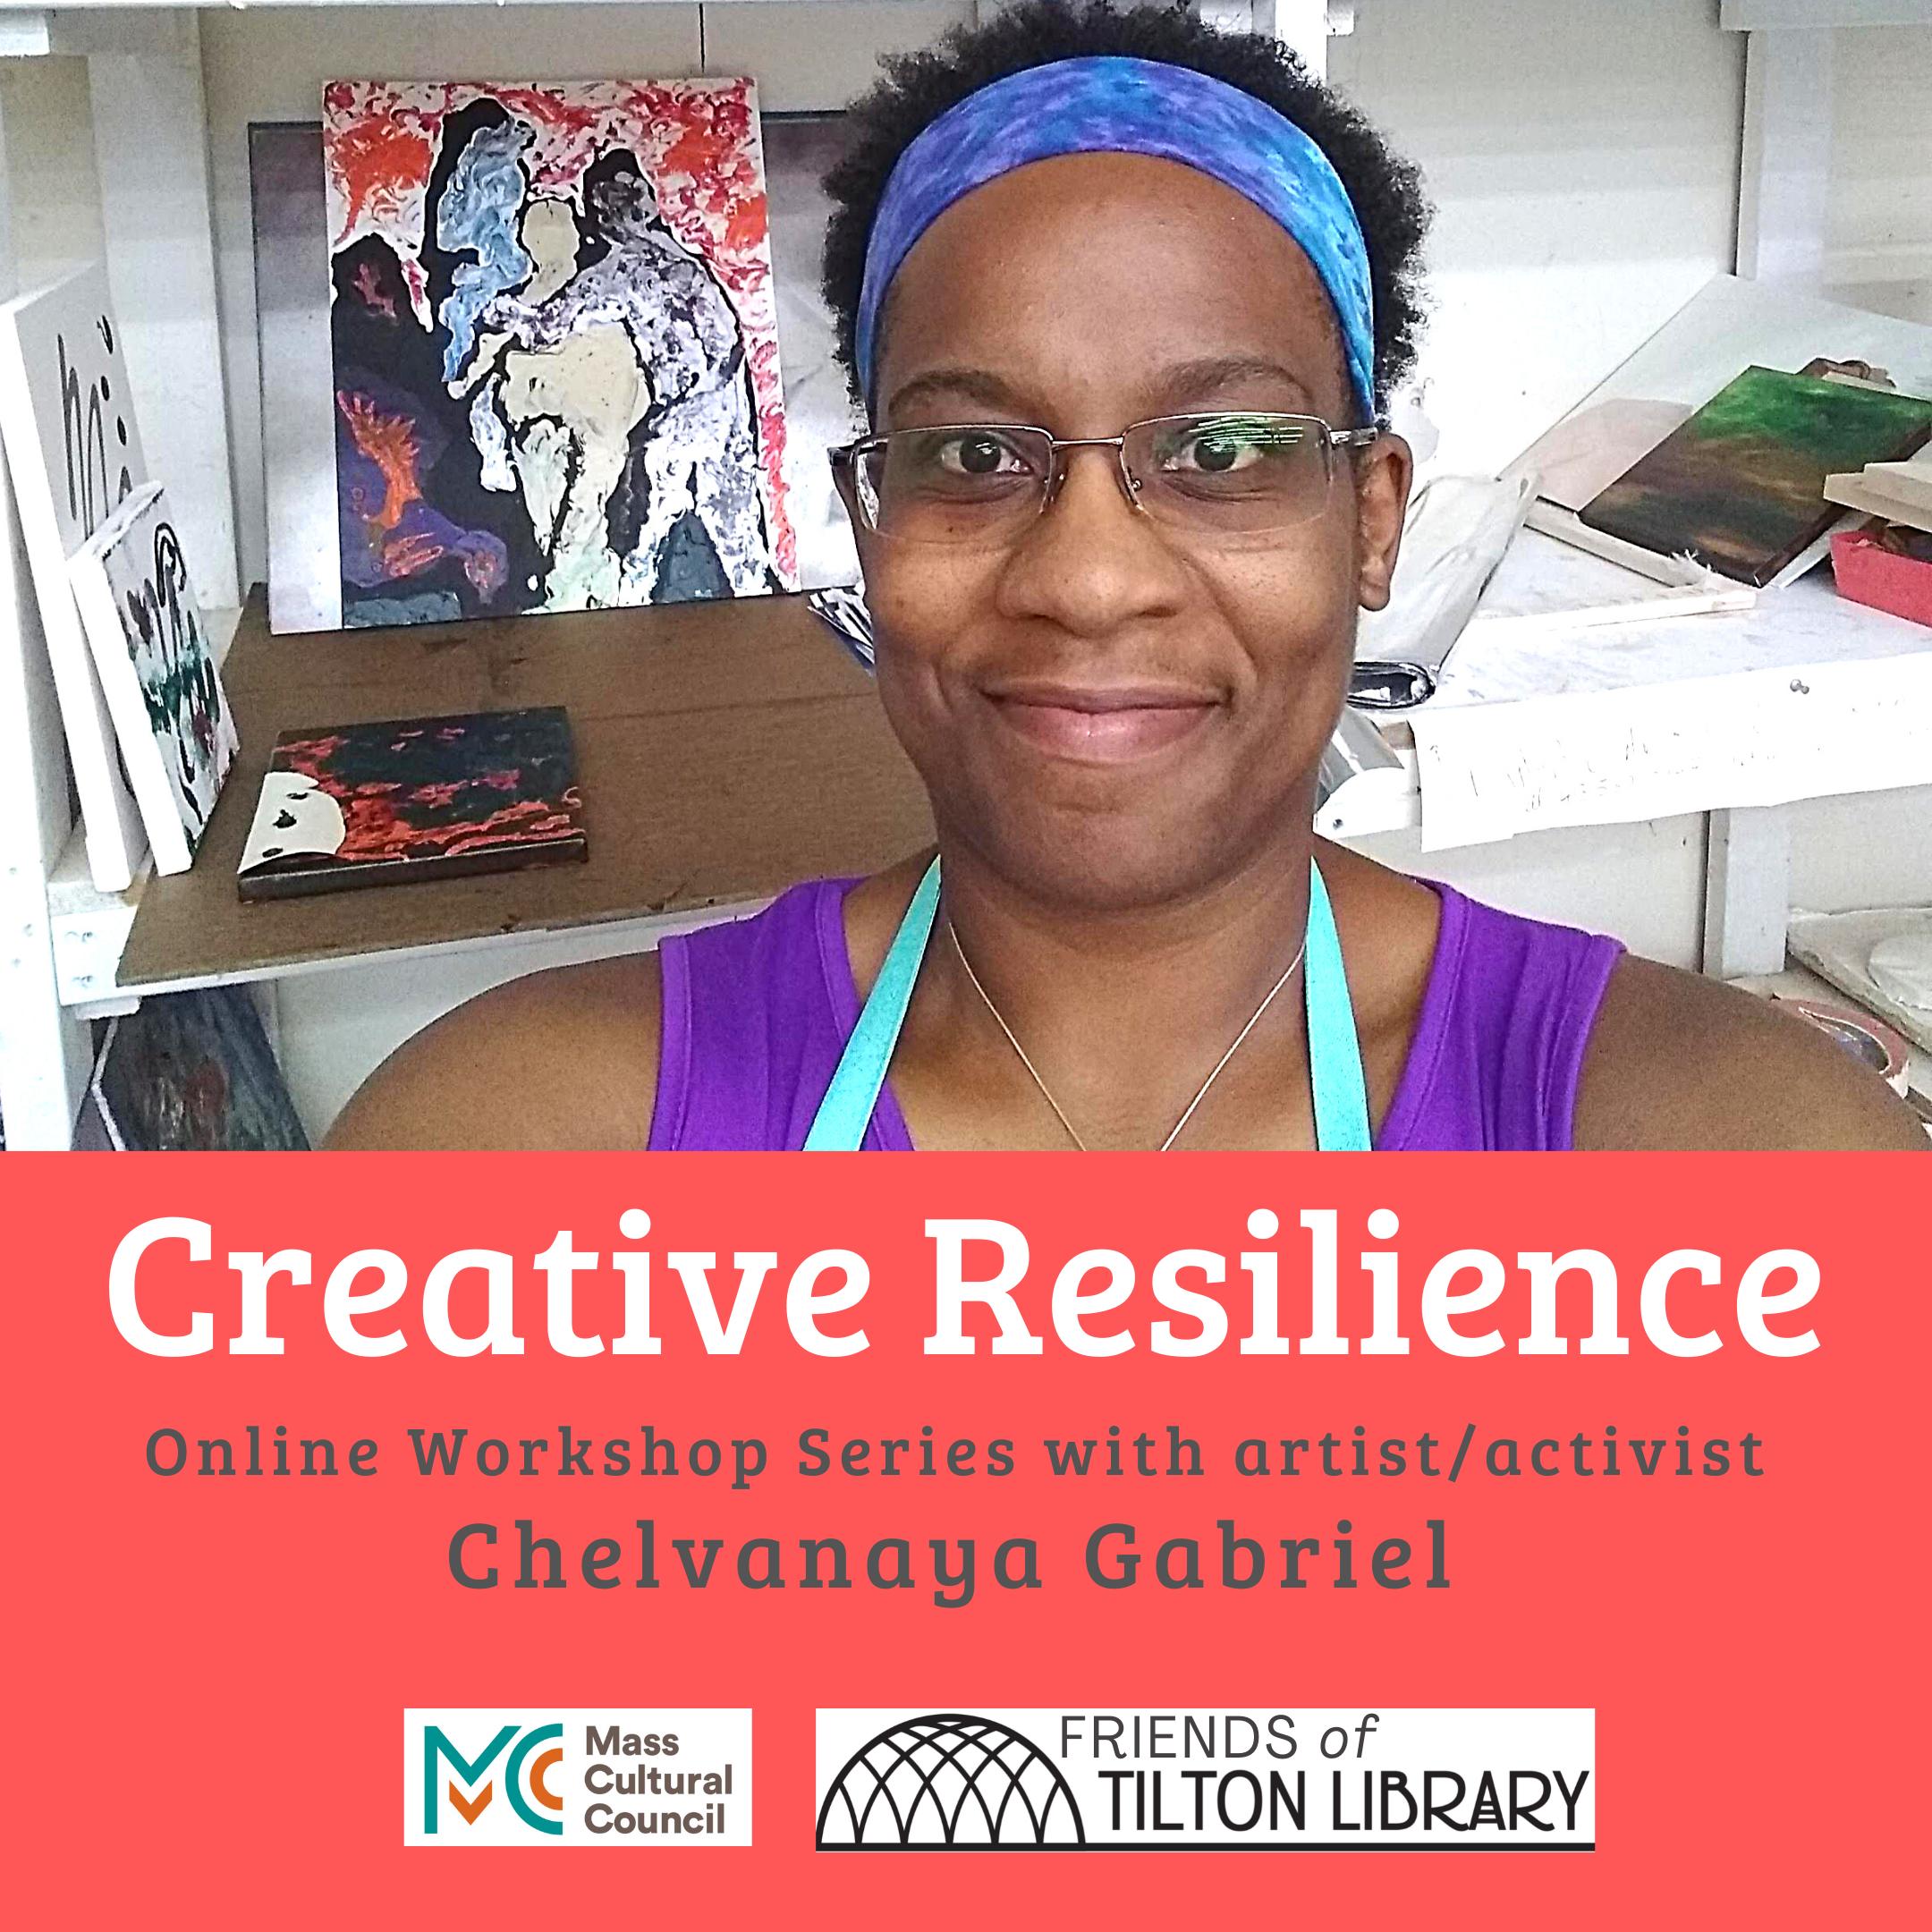 Tilton Library presents- Creative Resilience: Online Workshop Series with Chelvanaya Gabriel